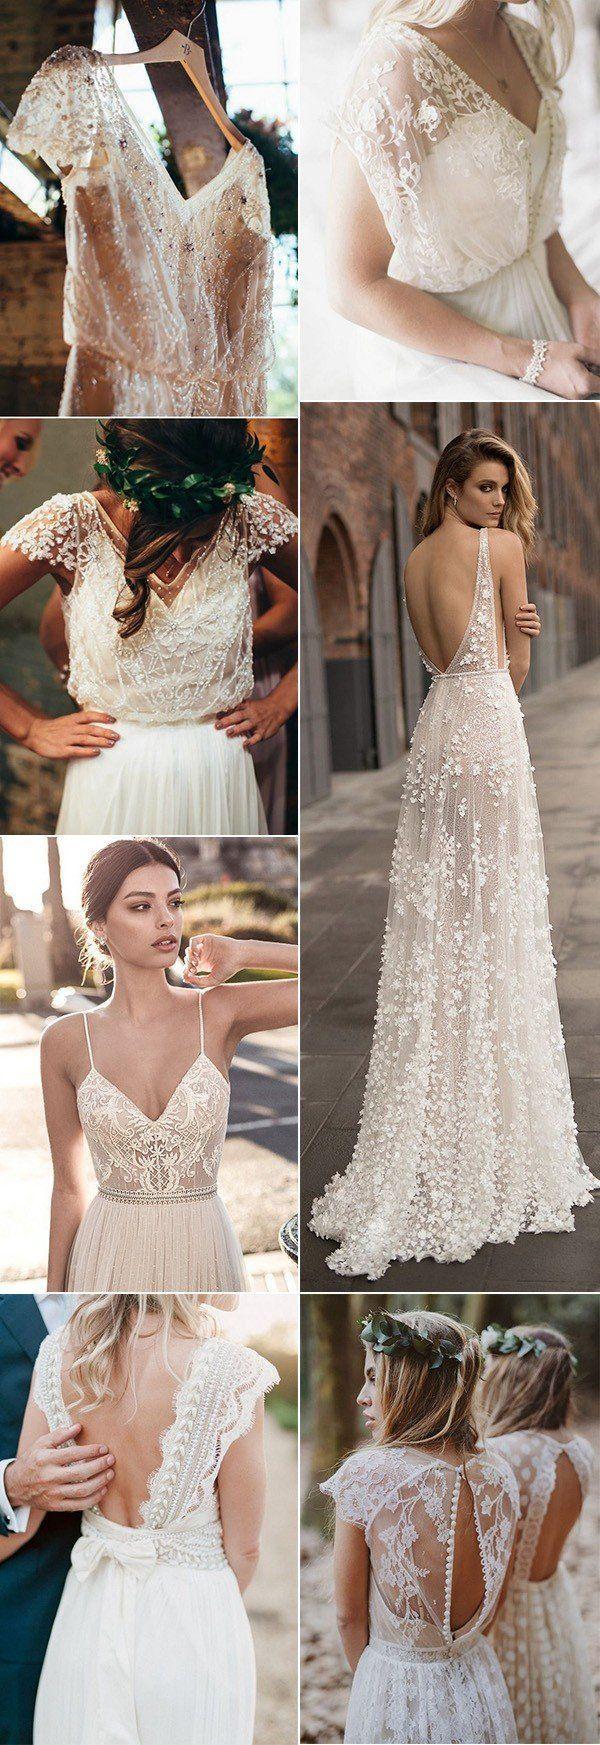 best wedding images on pinterest wedding gowns bridal dresses